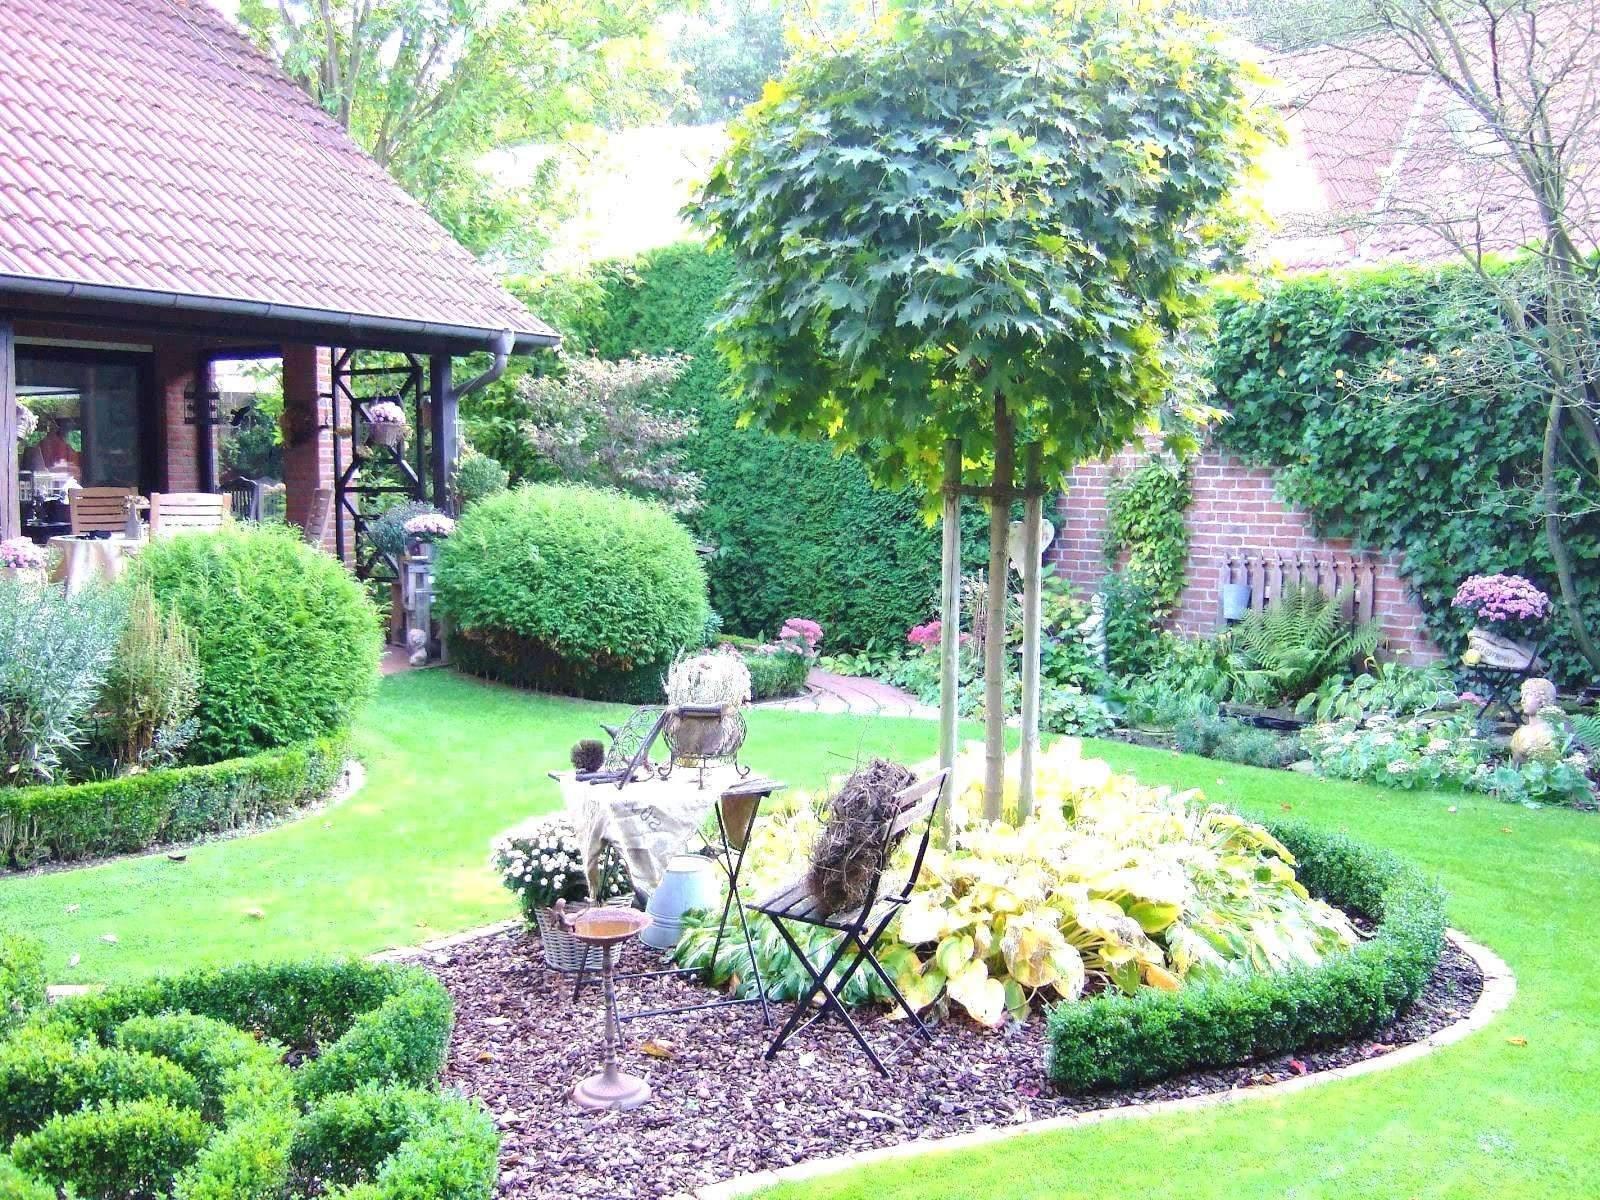 Gartengestaltung Pavillon Ideen Luxus 30 Einzigartig Garten Gestalten Ideen Frisch